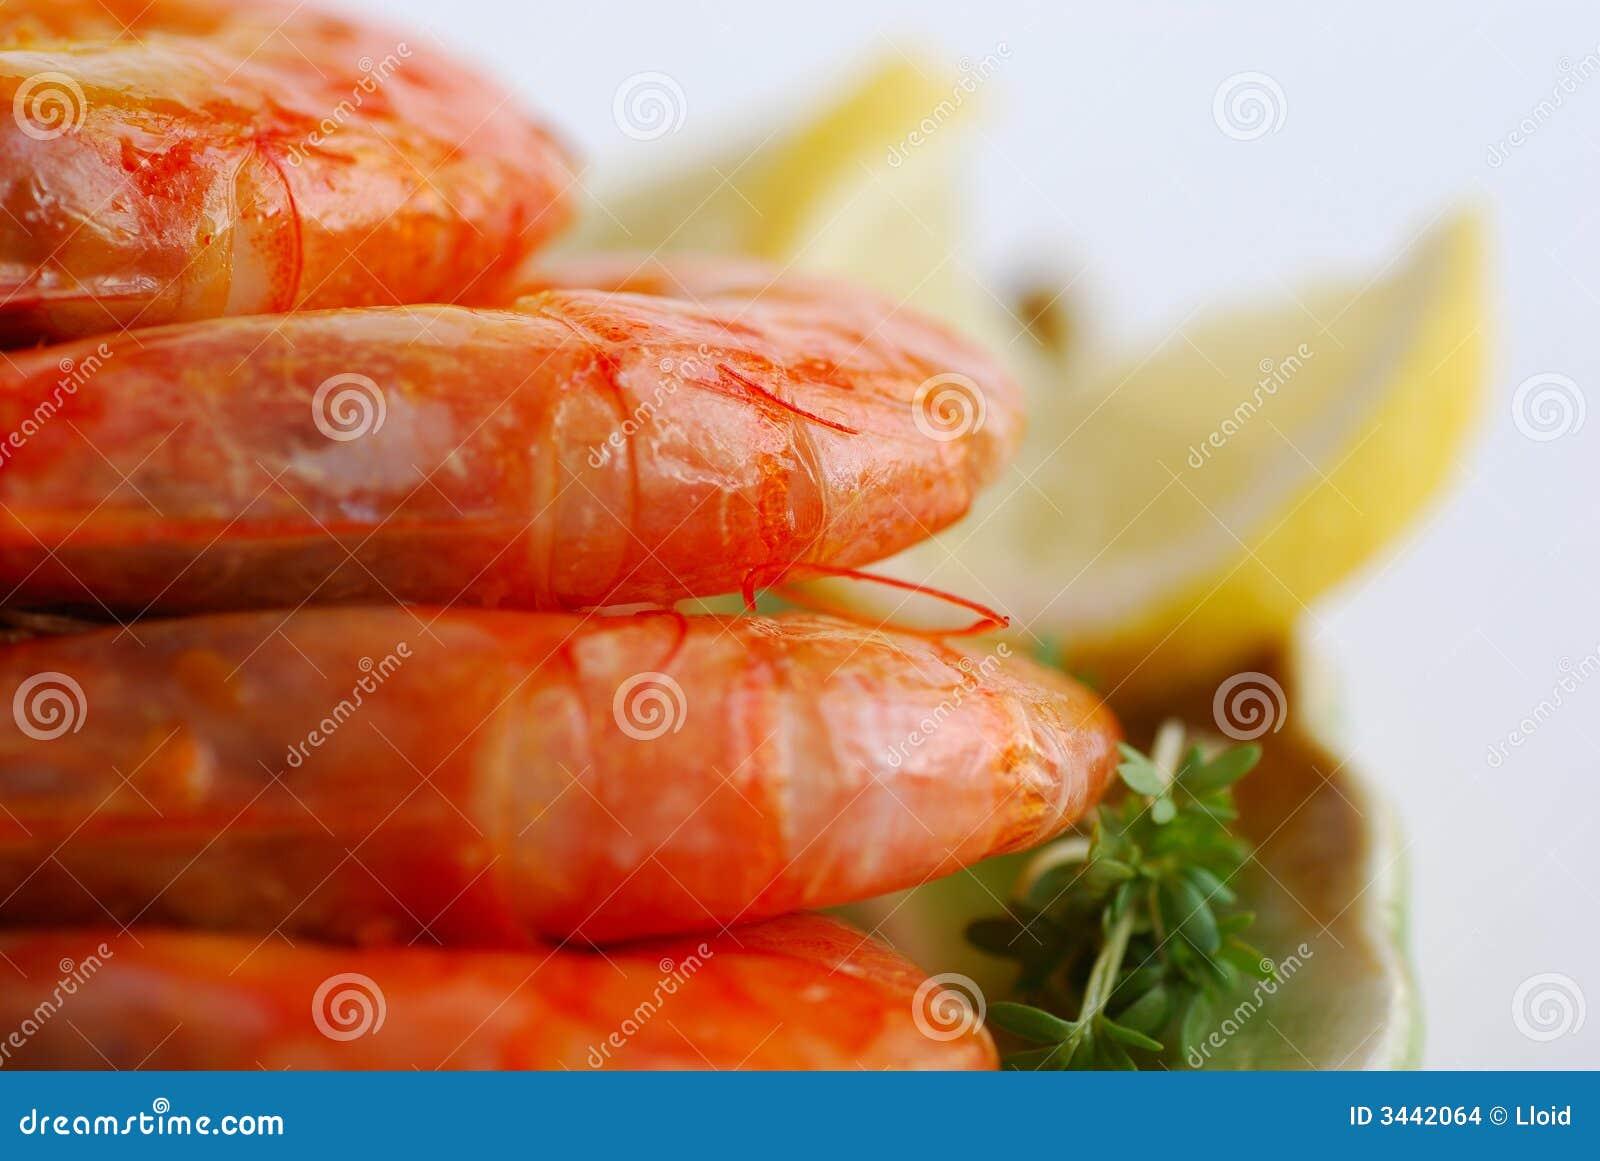 Shrimp Stock Images - Image: 3442064